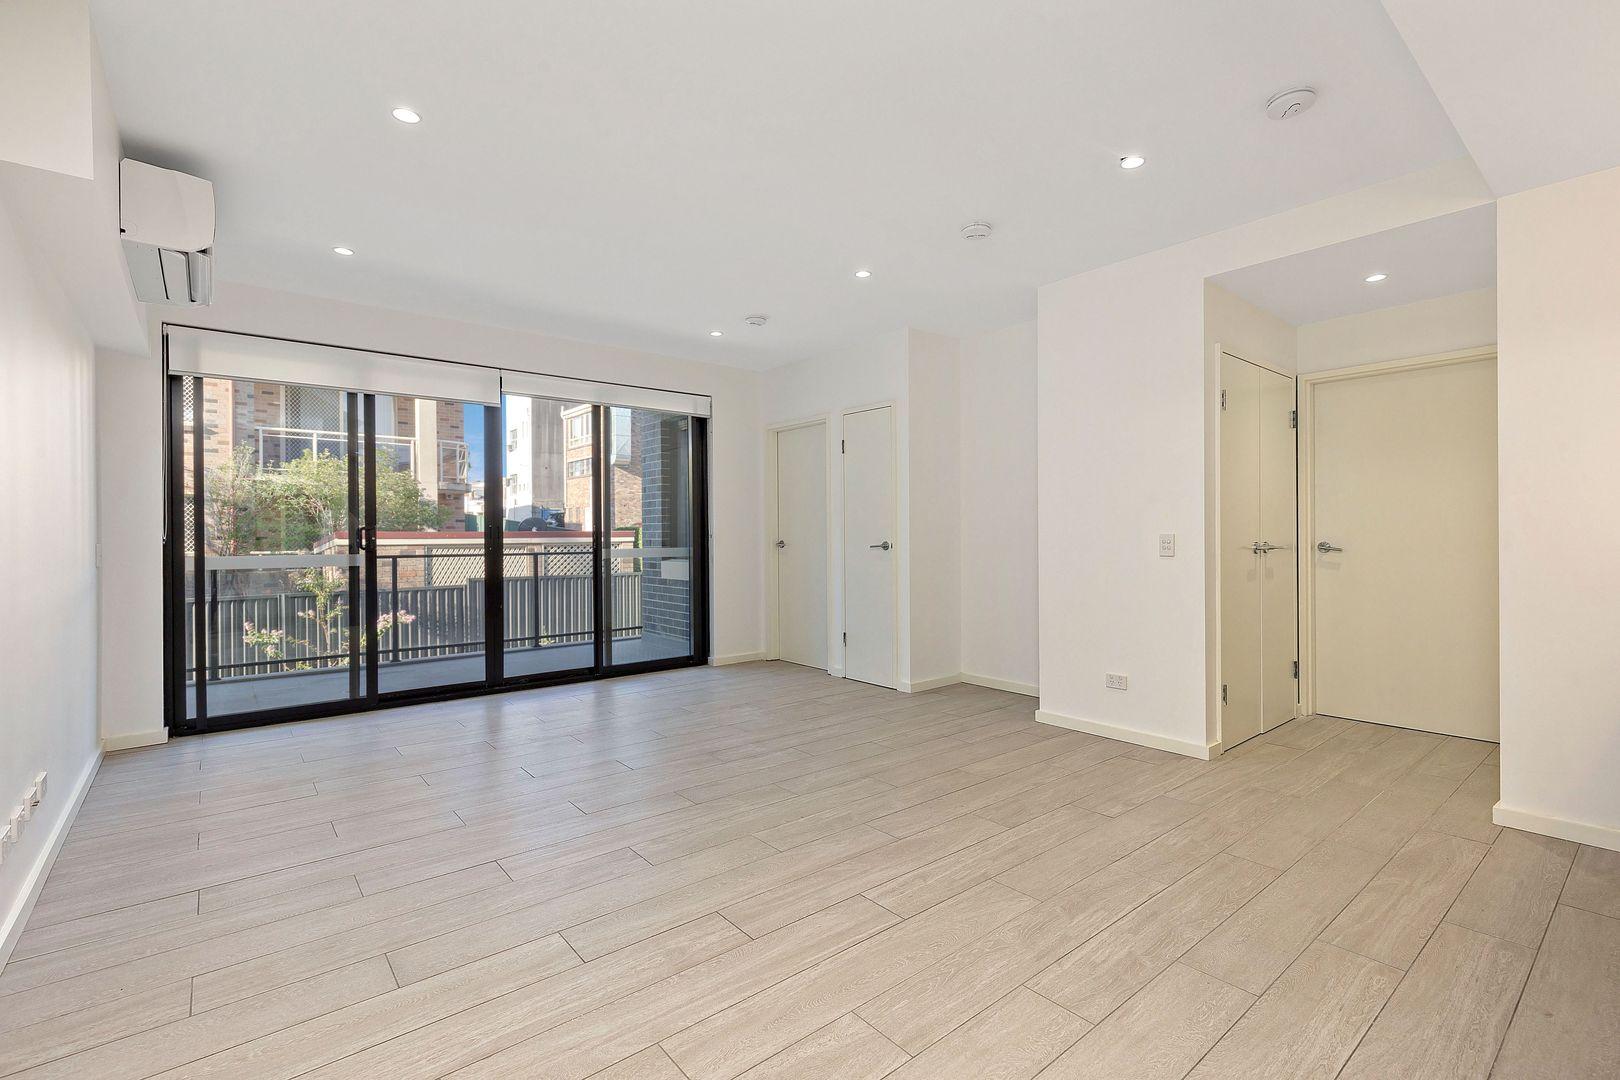 13/2-4 Morotai Avenue, Riverwood NSW 2210, Image 0